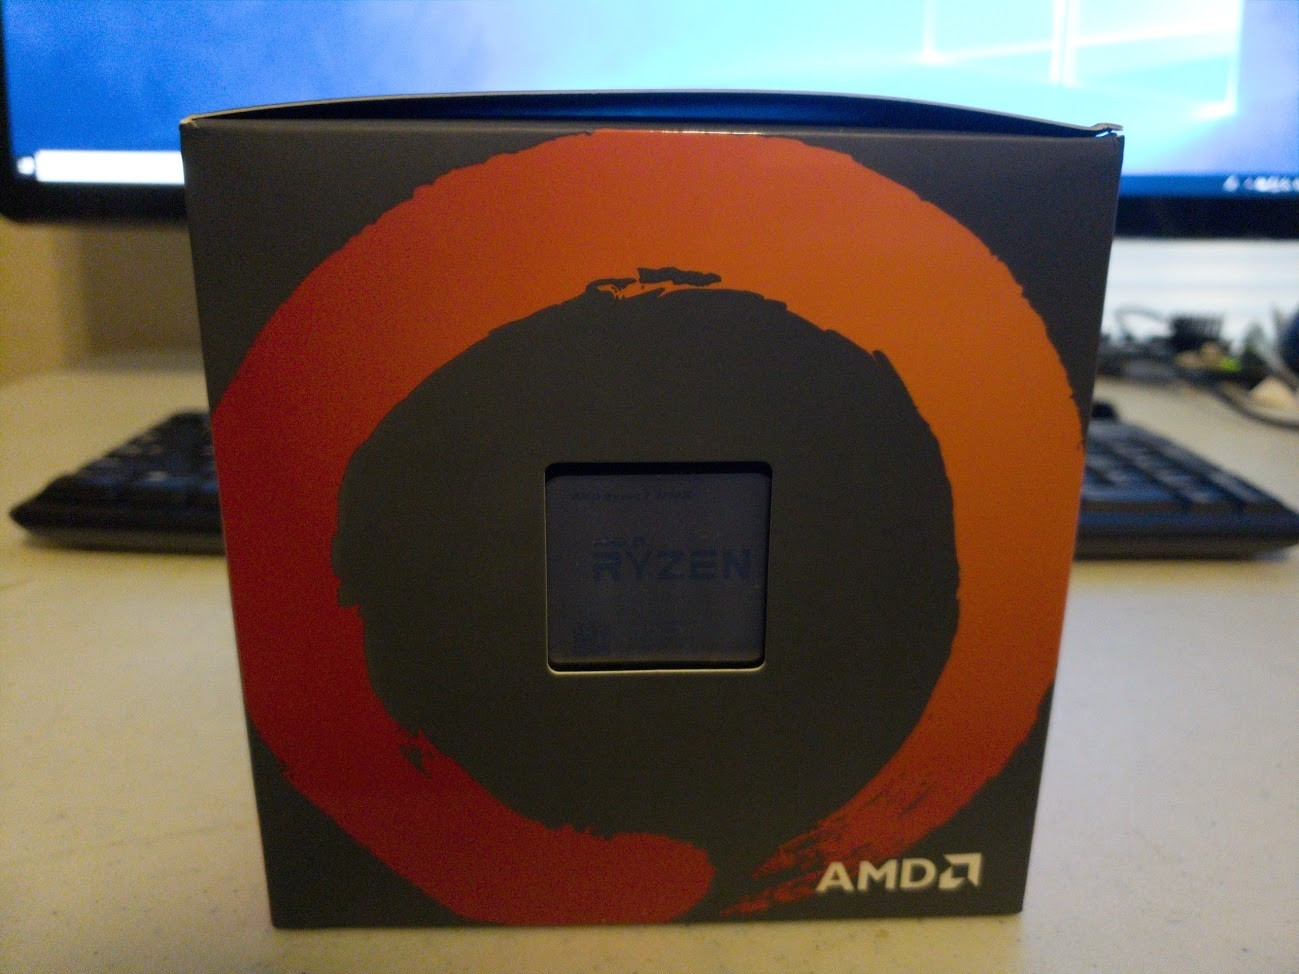 AMD Ryzen 7 2700X - 3